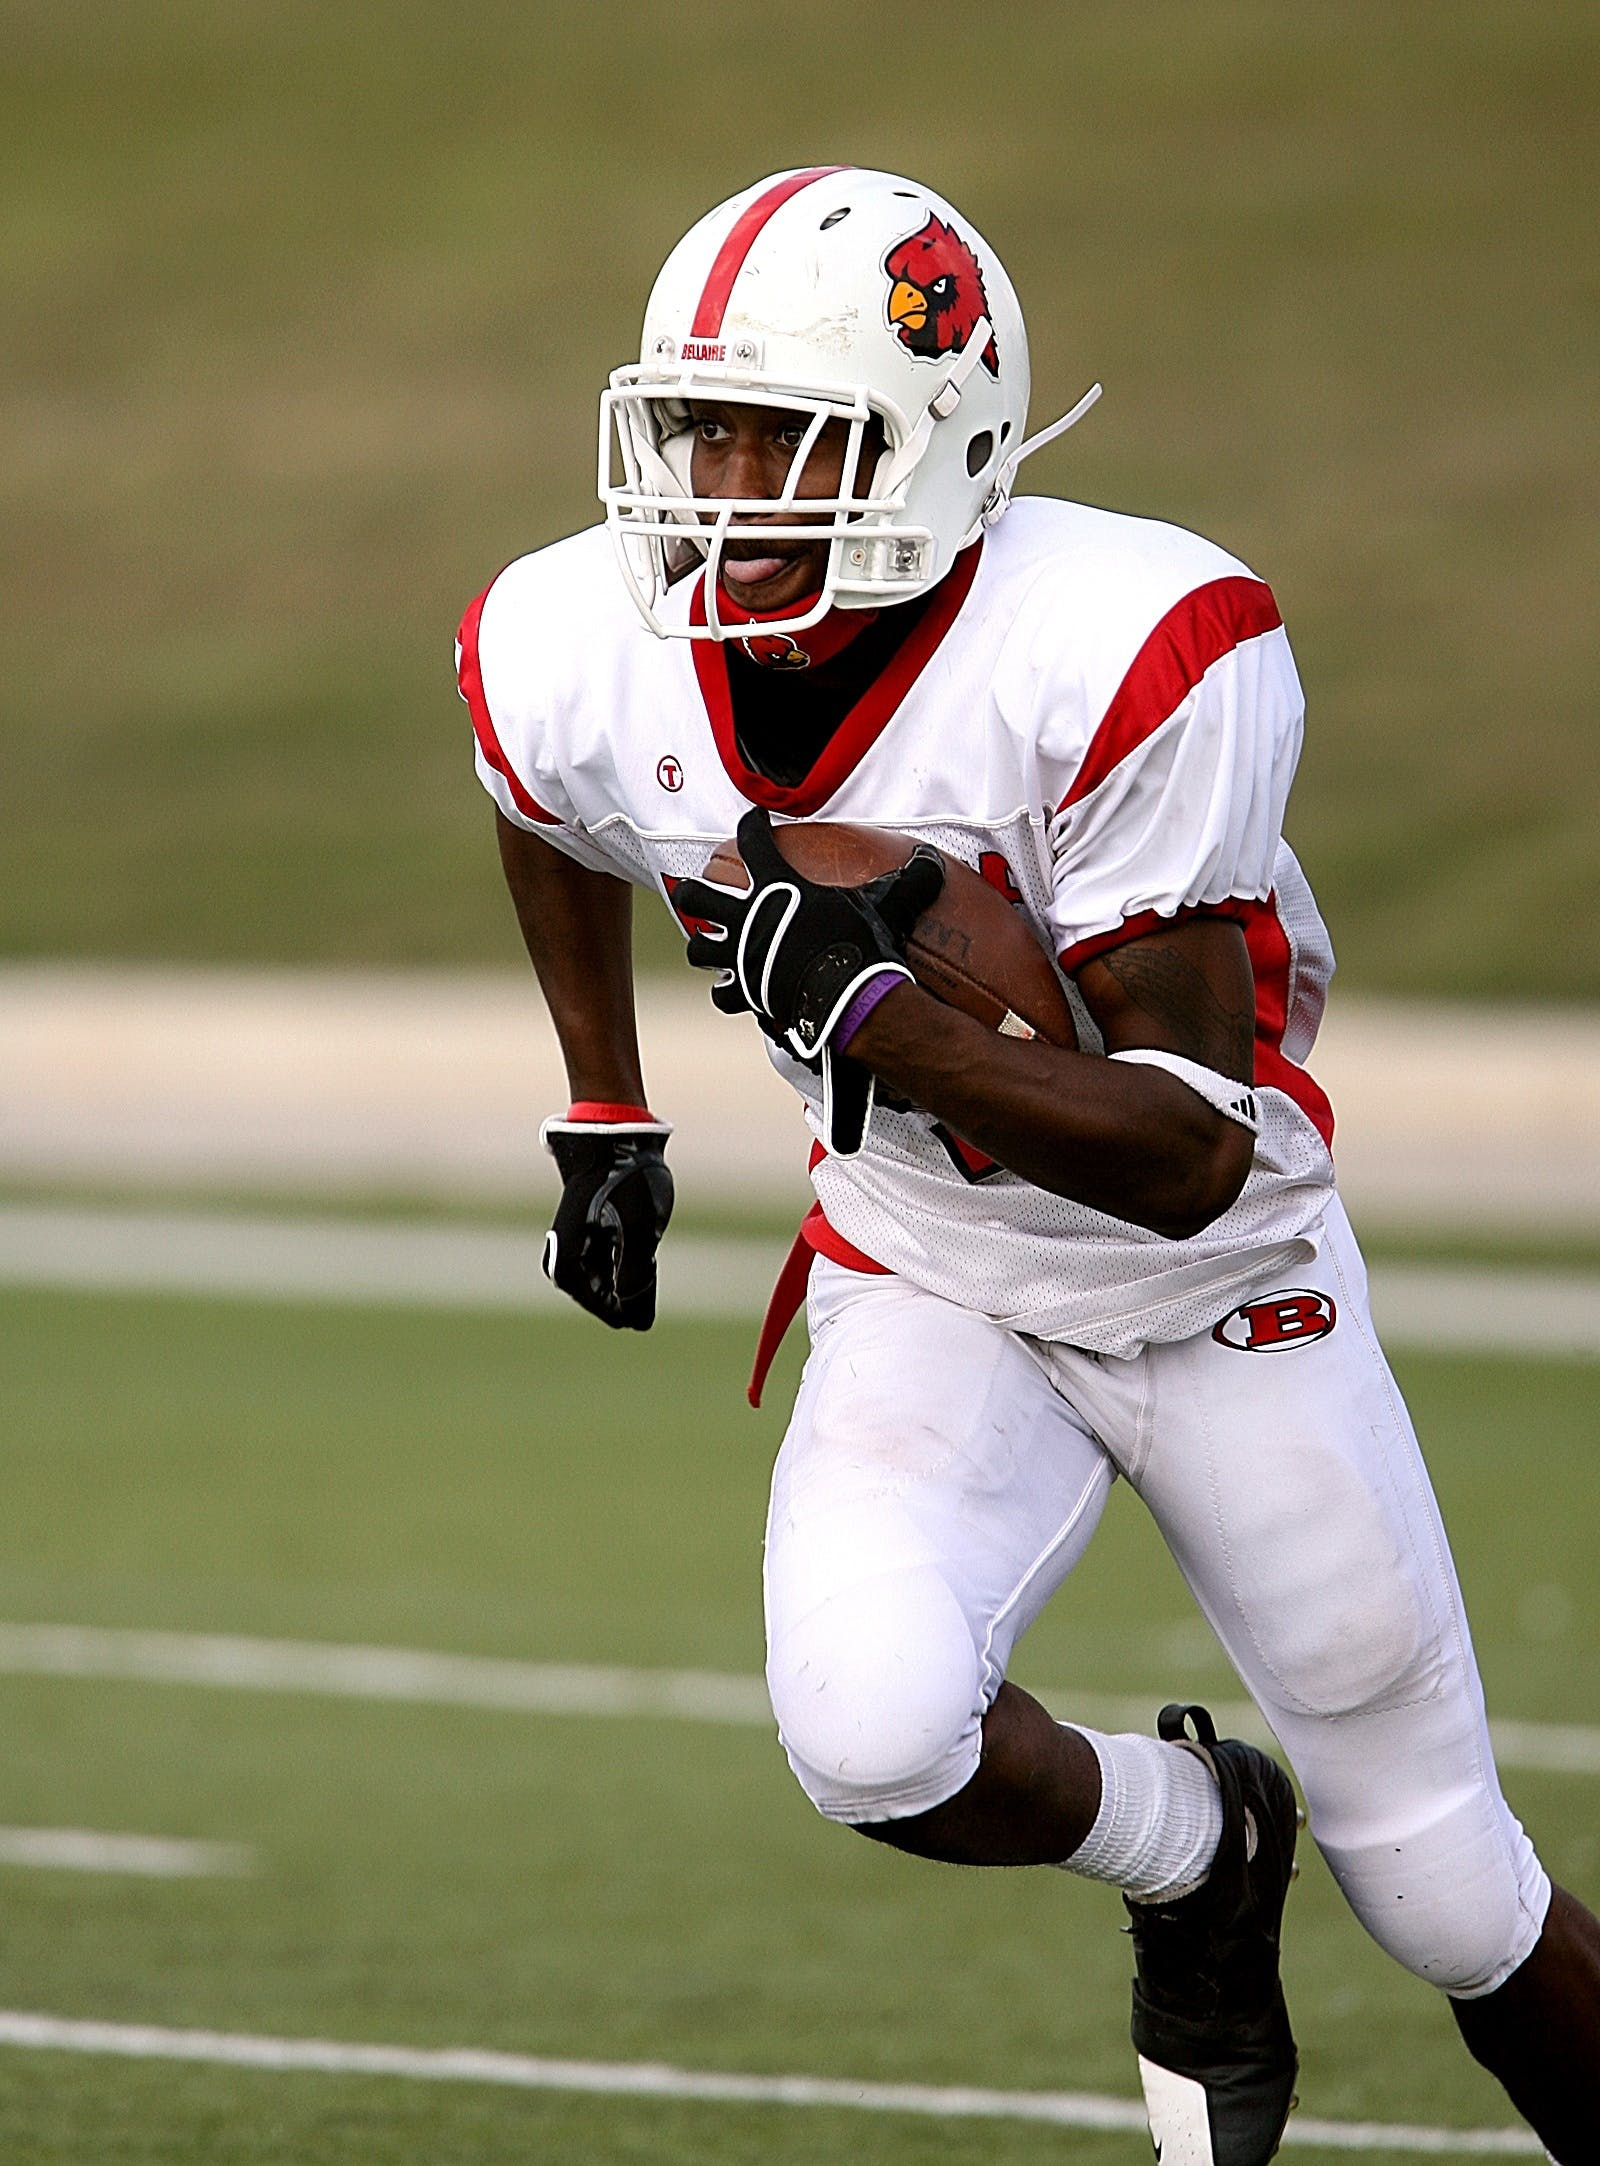 Football Player Running on Football Field